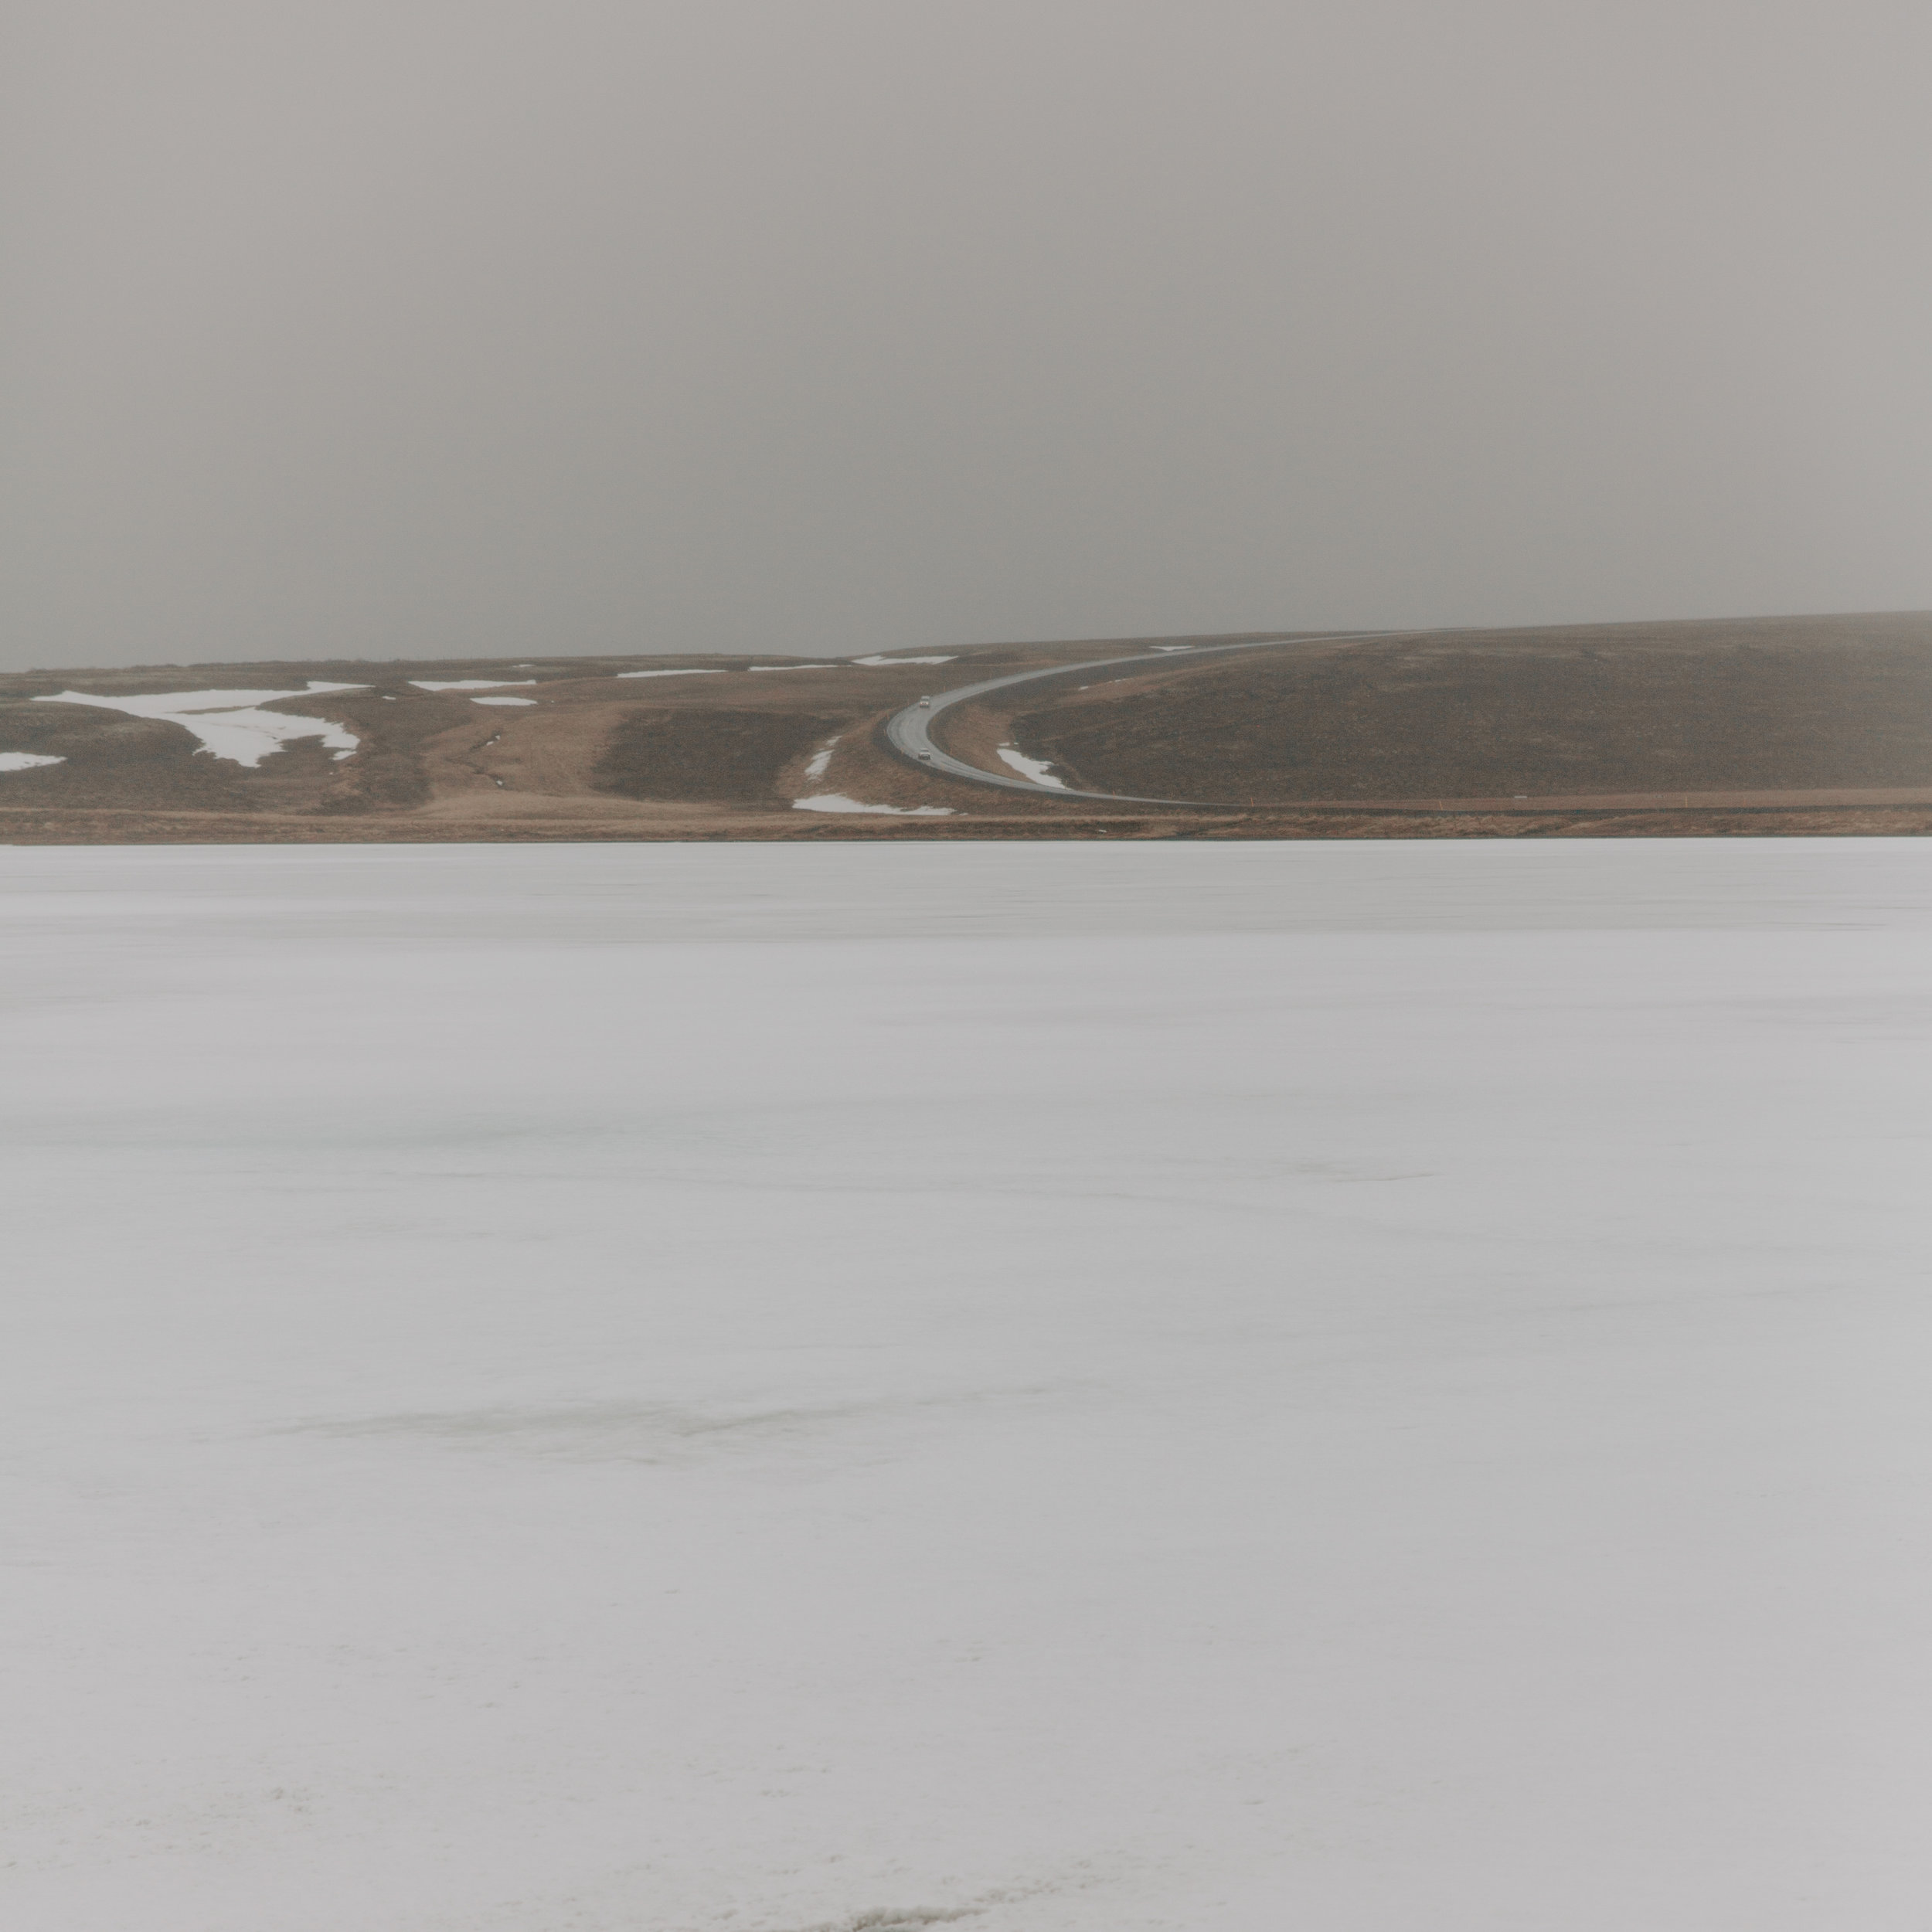 Iceland-honeymoon-4268.jpg